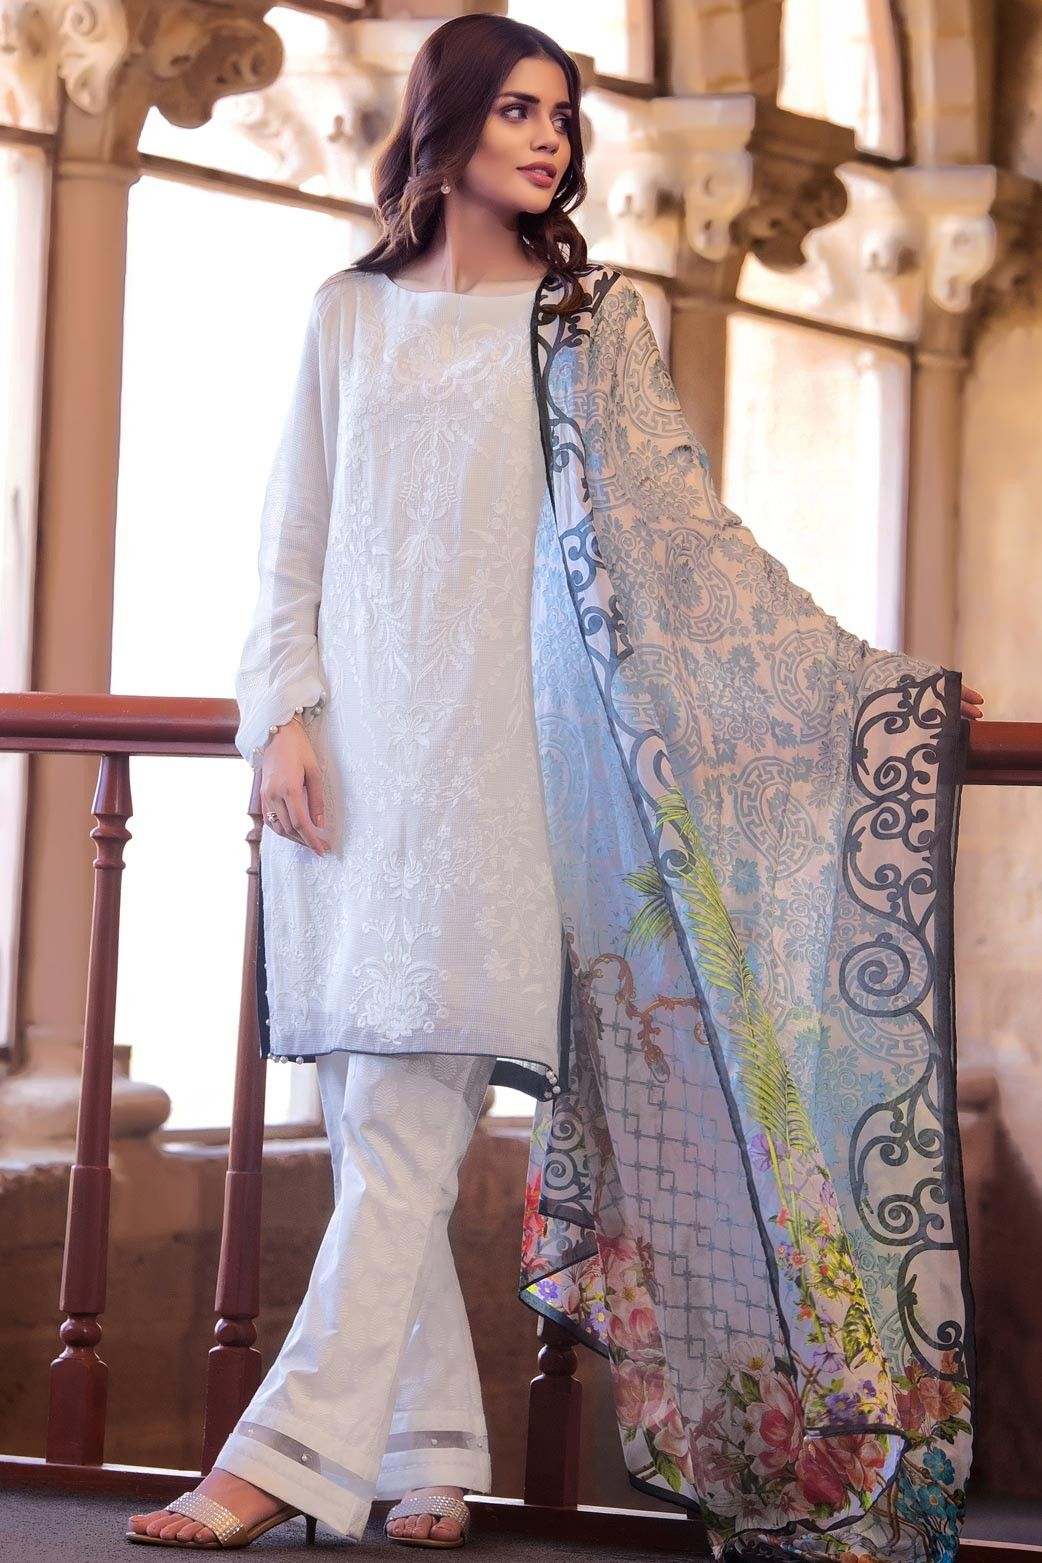 5096a85448 Online Indian and Pakistani dresses, Buy Pakistani shalwar kameez dresses  and indian clothing.